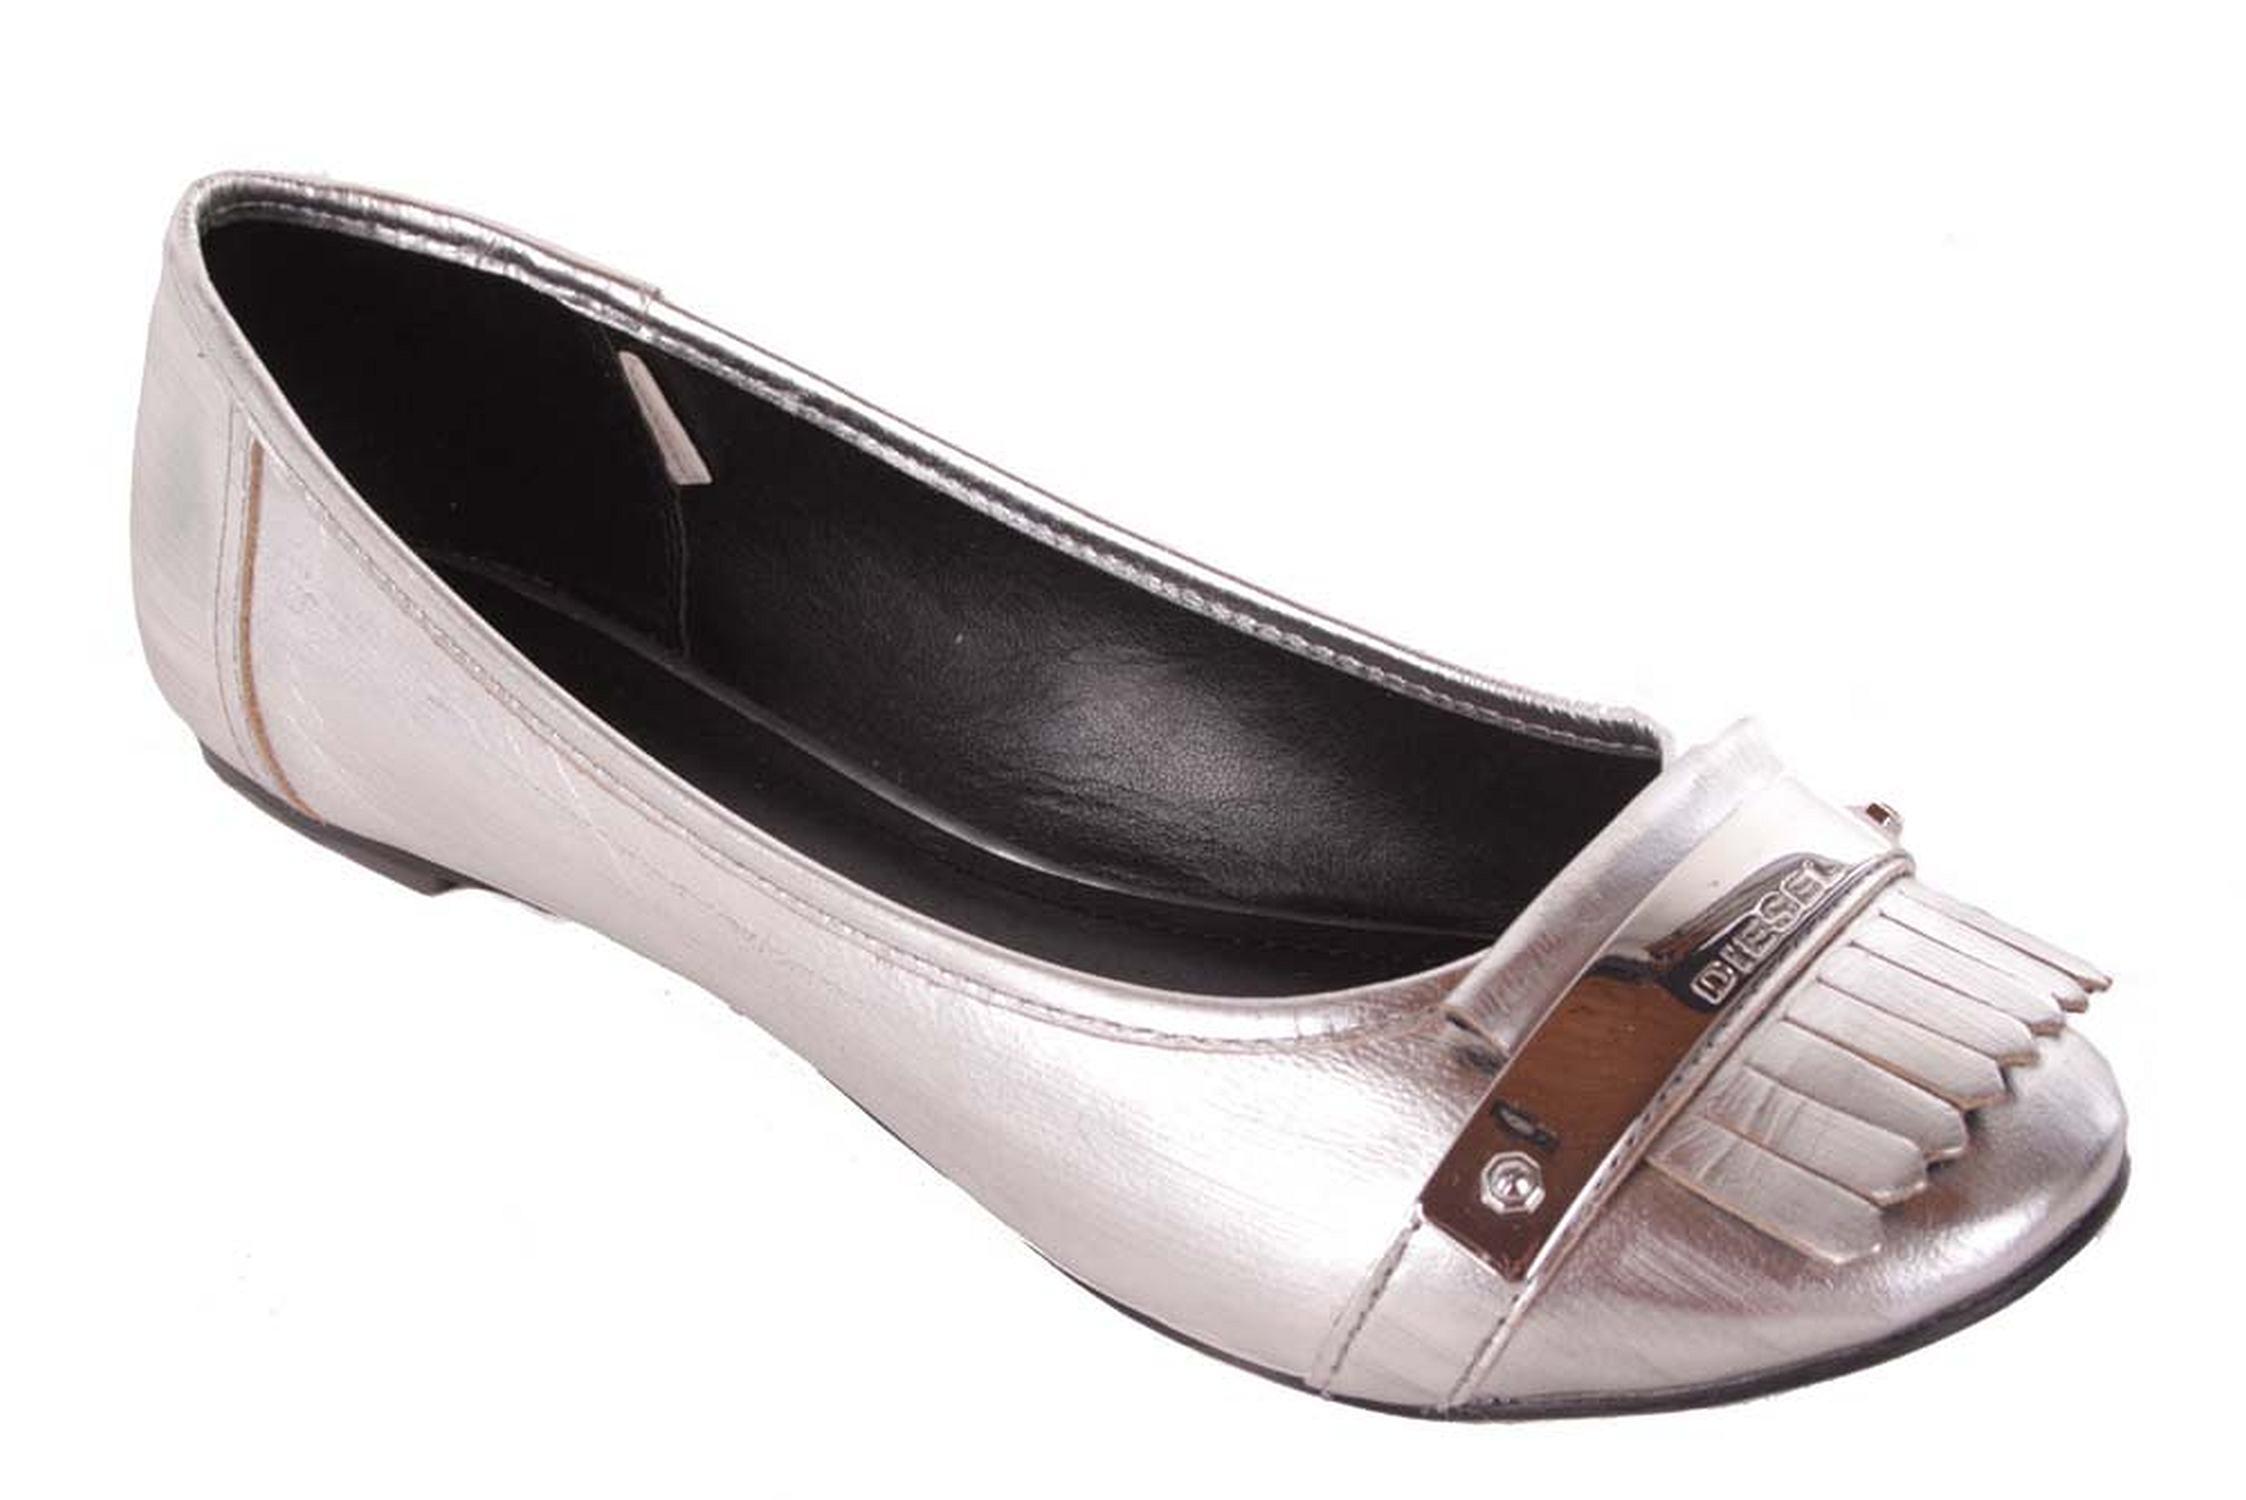 diesel damen ballerina slipper haneta silber 168 ebay. Black Bedroom Furniture Sets. Home Design Ideas